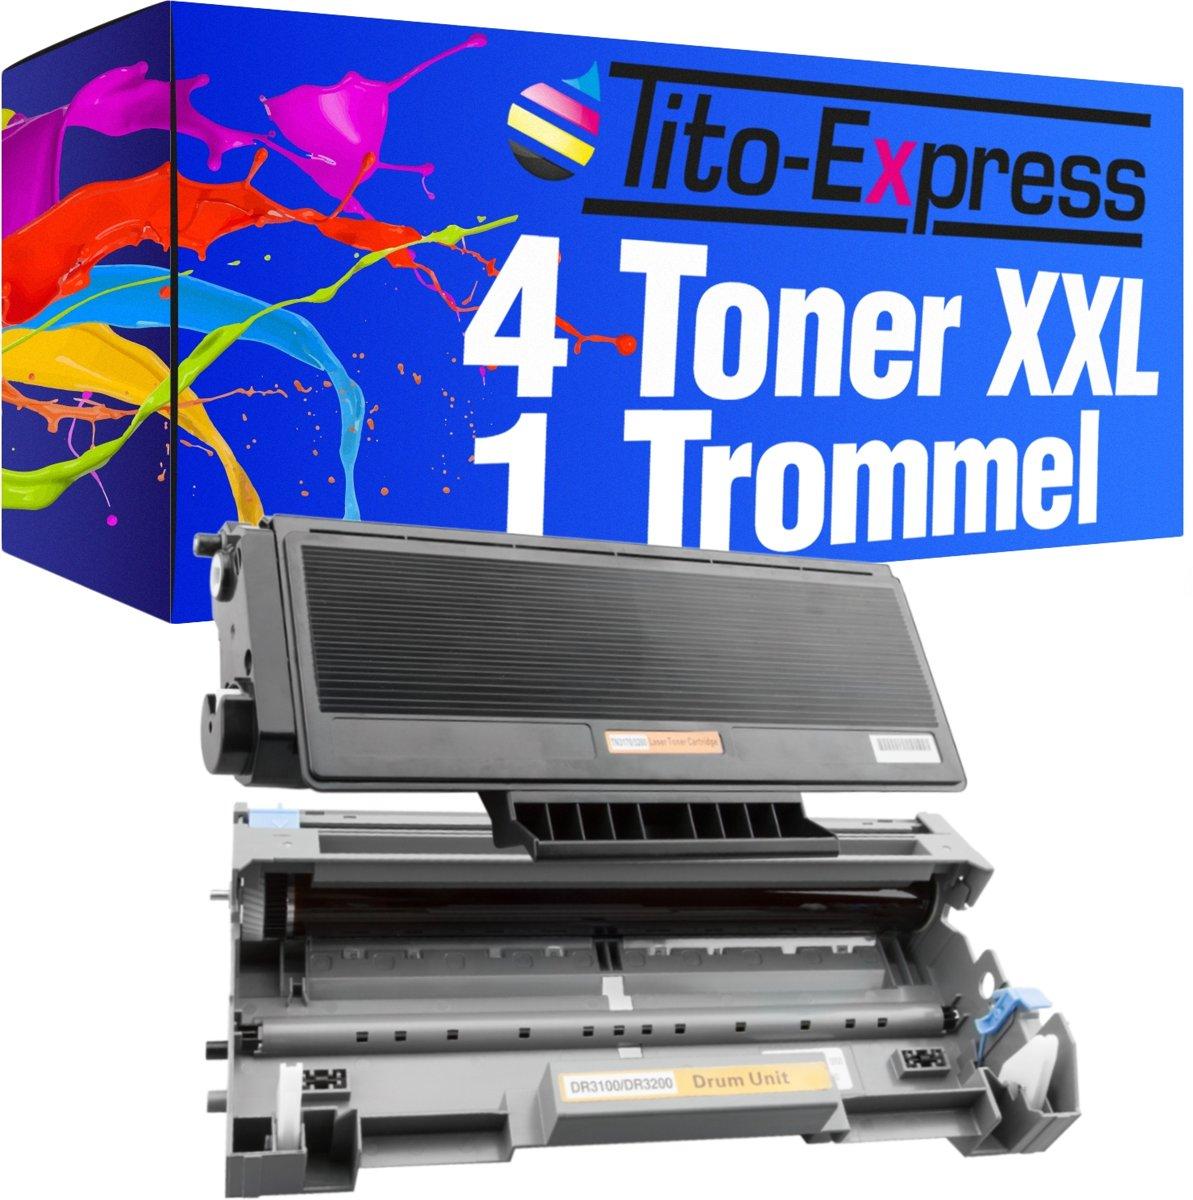 Tito-Express PlatinumSerie PlatinumSerie® 4 x toner & drum XXL zwart compatibel brother TN 3170 & DR3100 DCP-8060 / DCP-8065DN / HL-5200 / HL-5240 / HL-5240DN / HL-5240DNLT / HL-5240L / HL-5250DN / HL-5250DNHY / HL-5250DNLT / HL-5270DN / HL-5270DNLT kopen